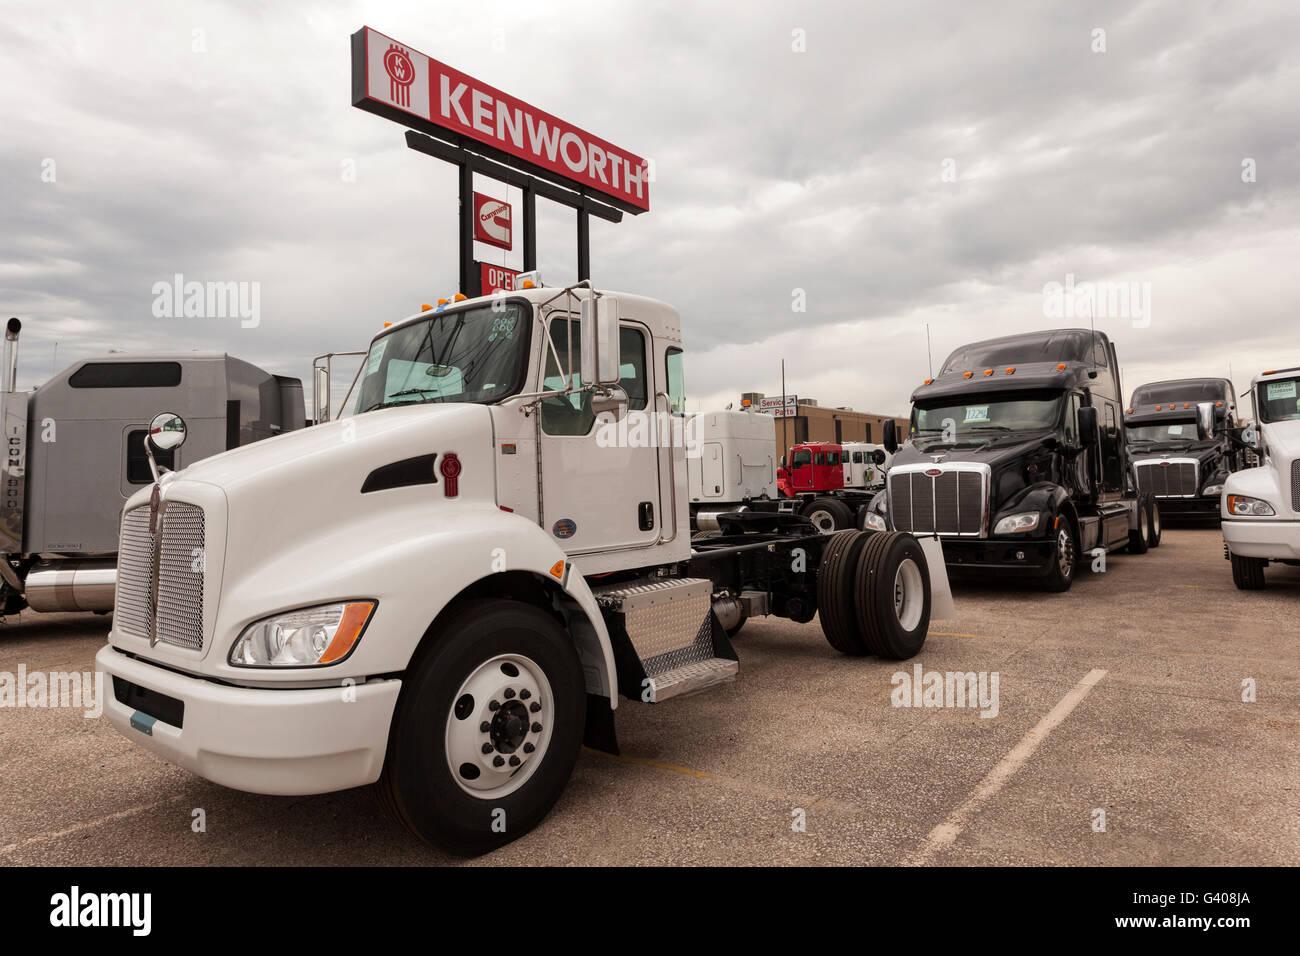 New Kenworth T270 Truck - Stock Image